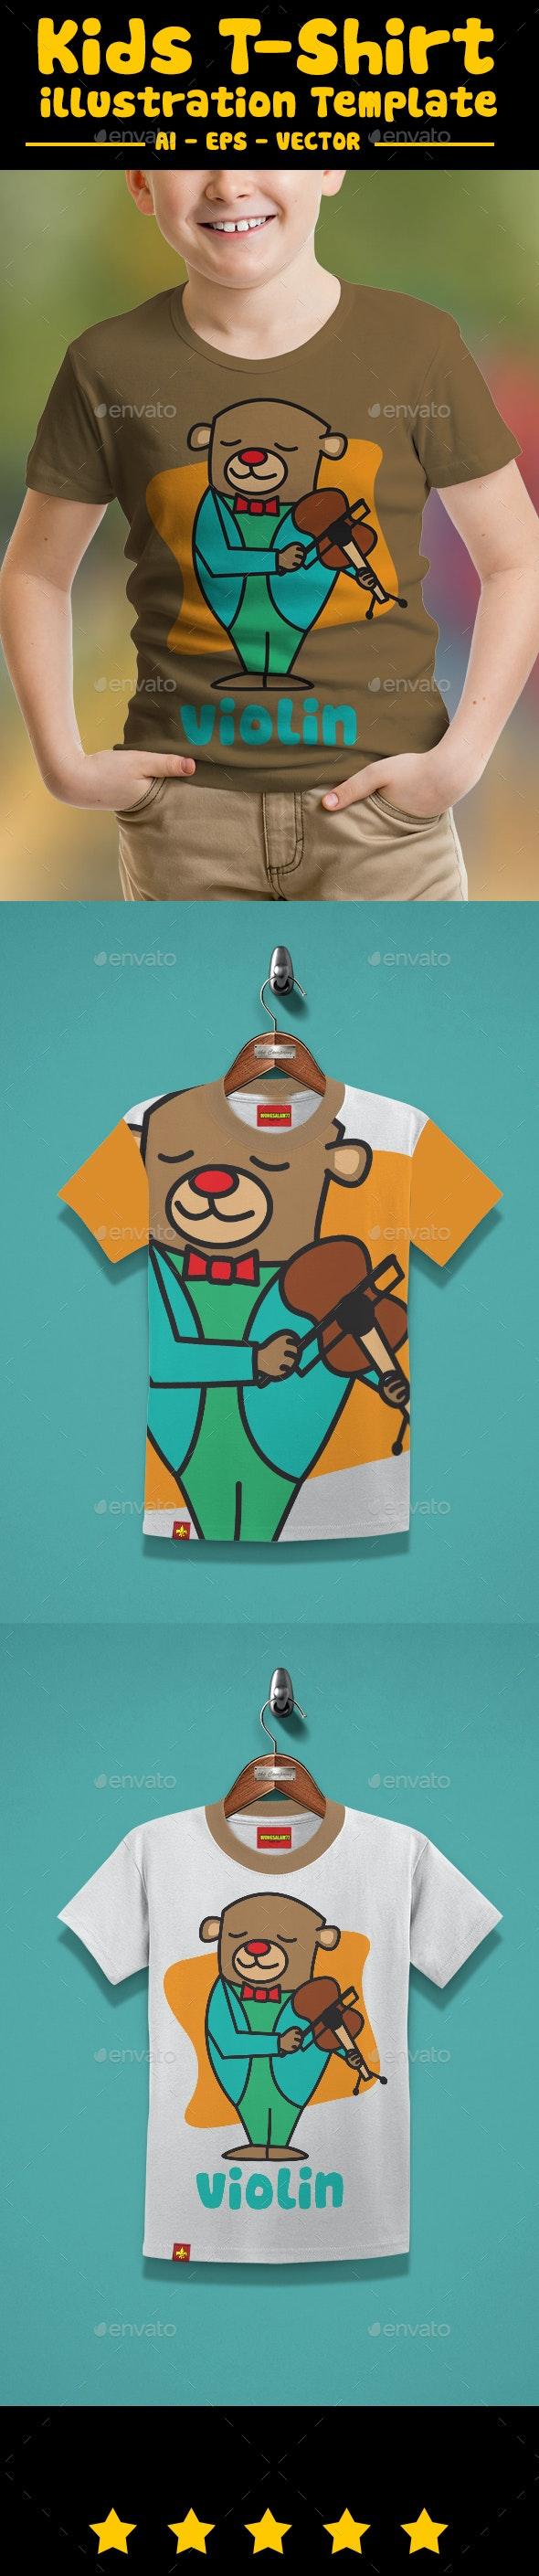 Bear with Violin Kids T-Shirt - T-Shirts